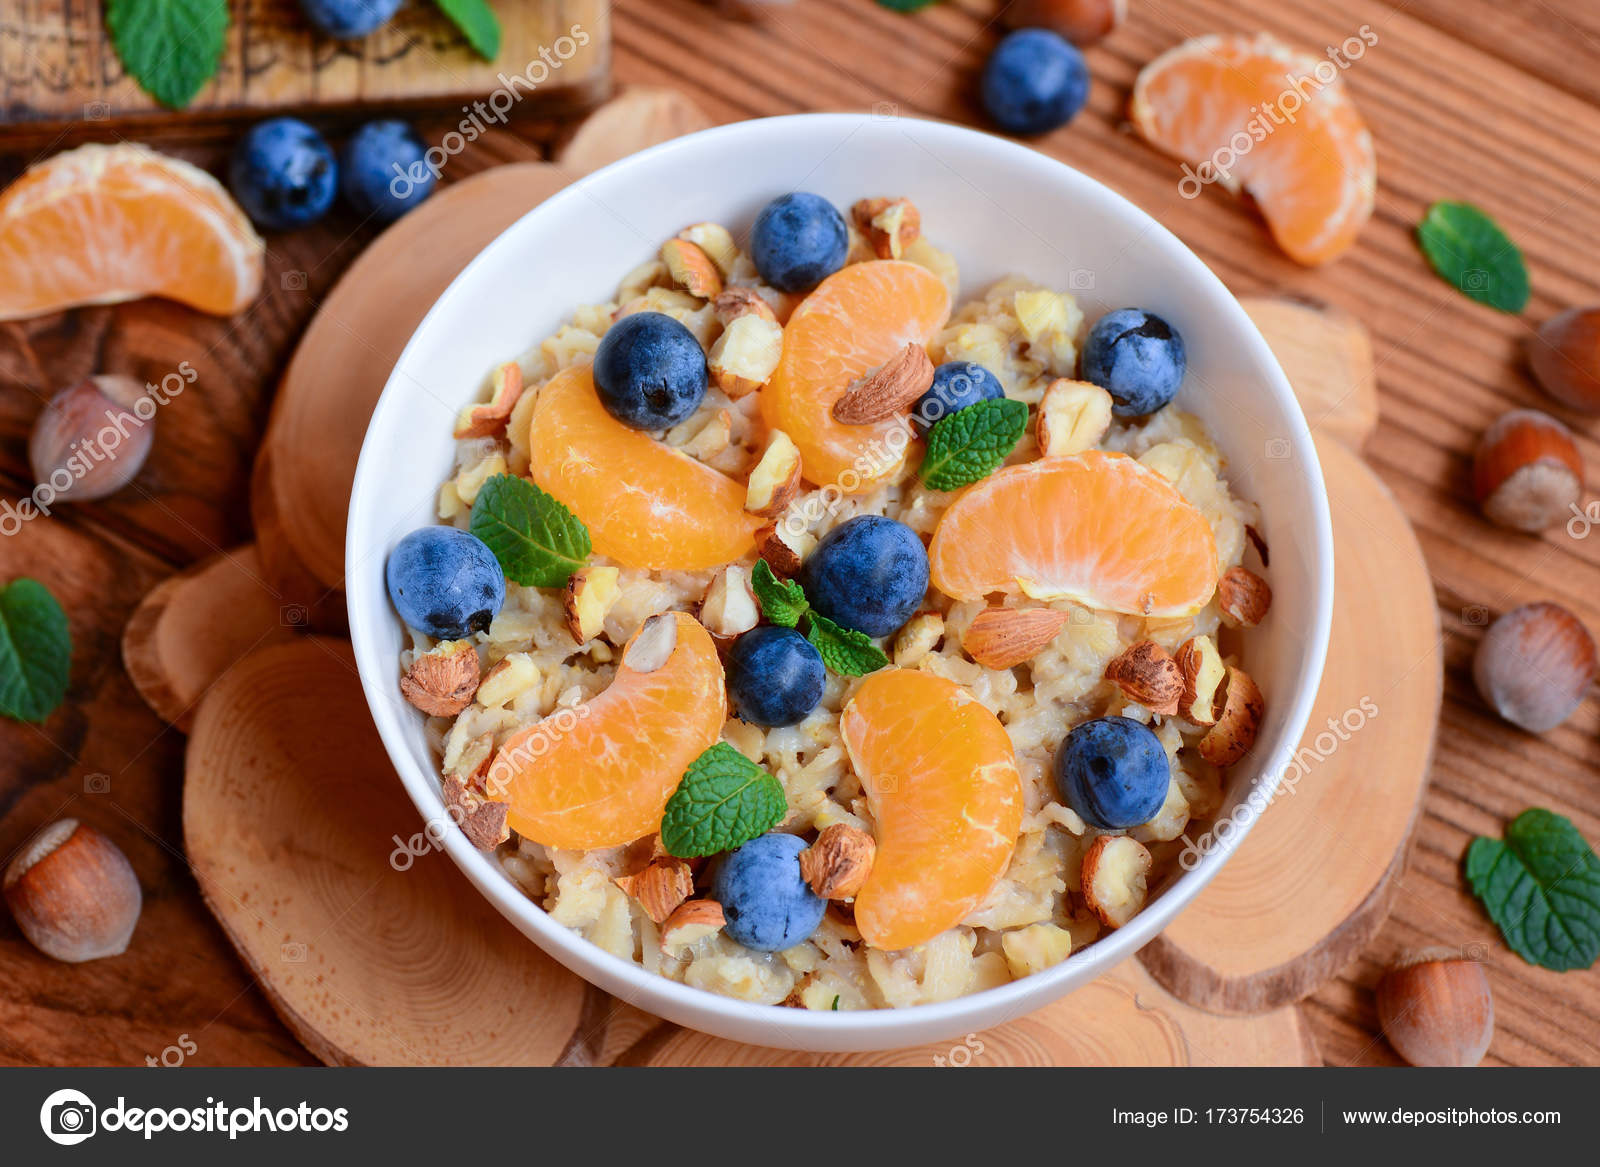 Oats porridge with berries and nuts. Homemade porridge with fresh ...